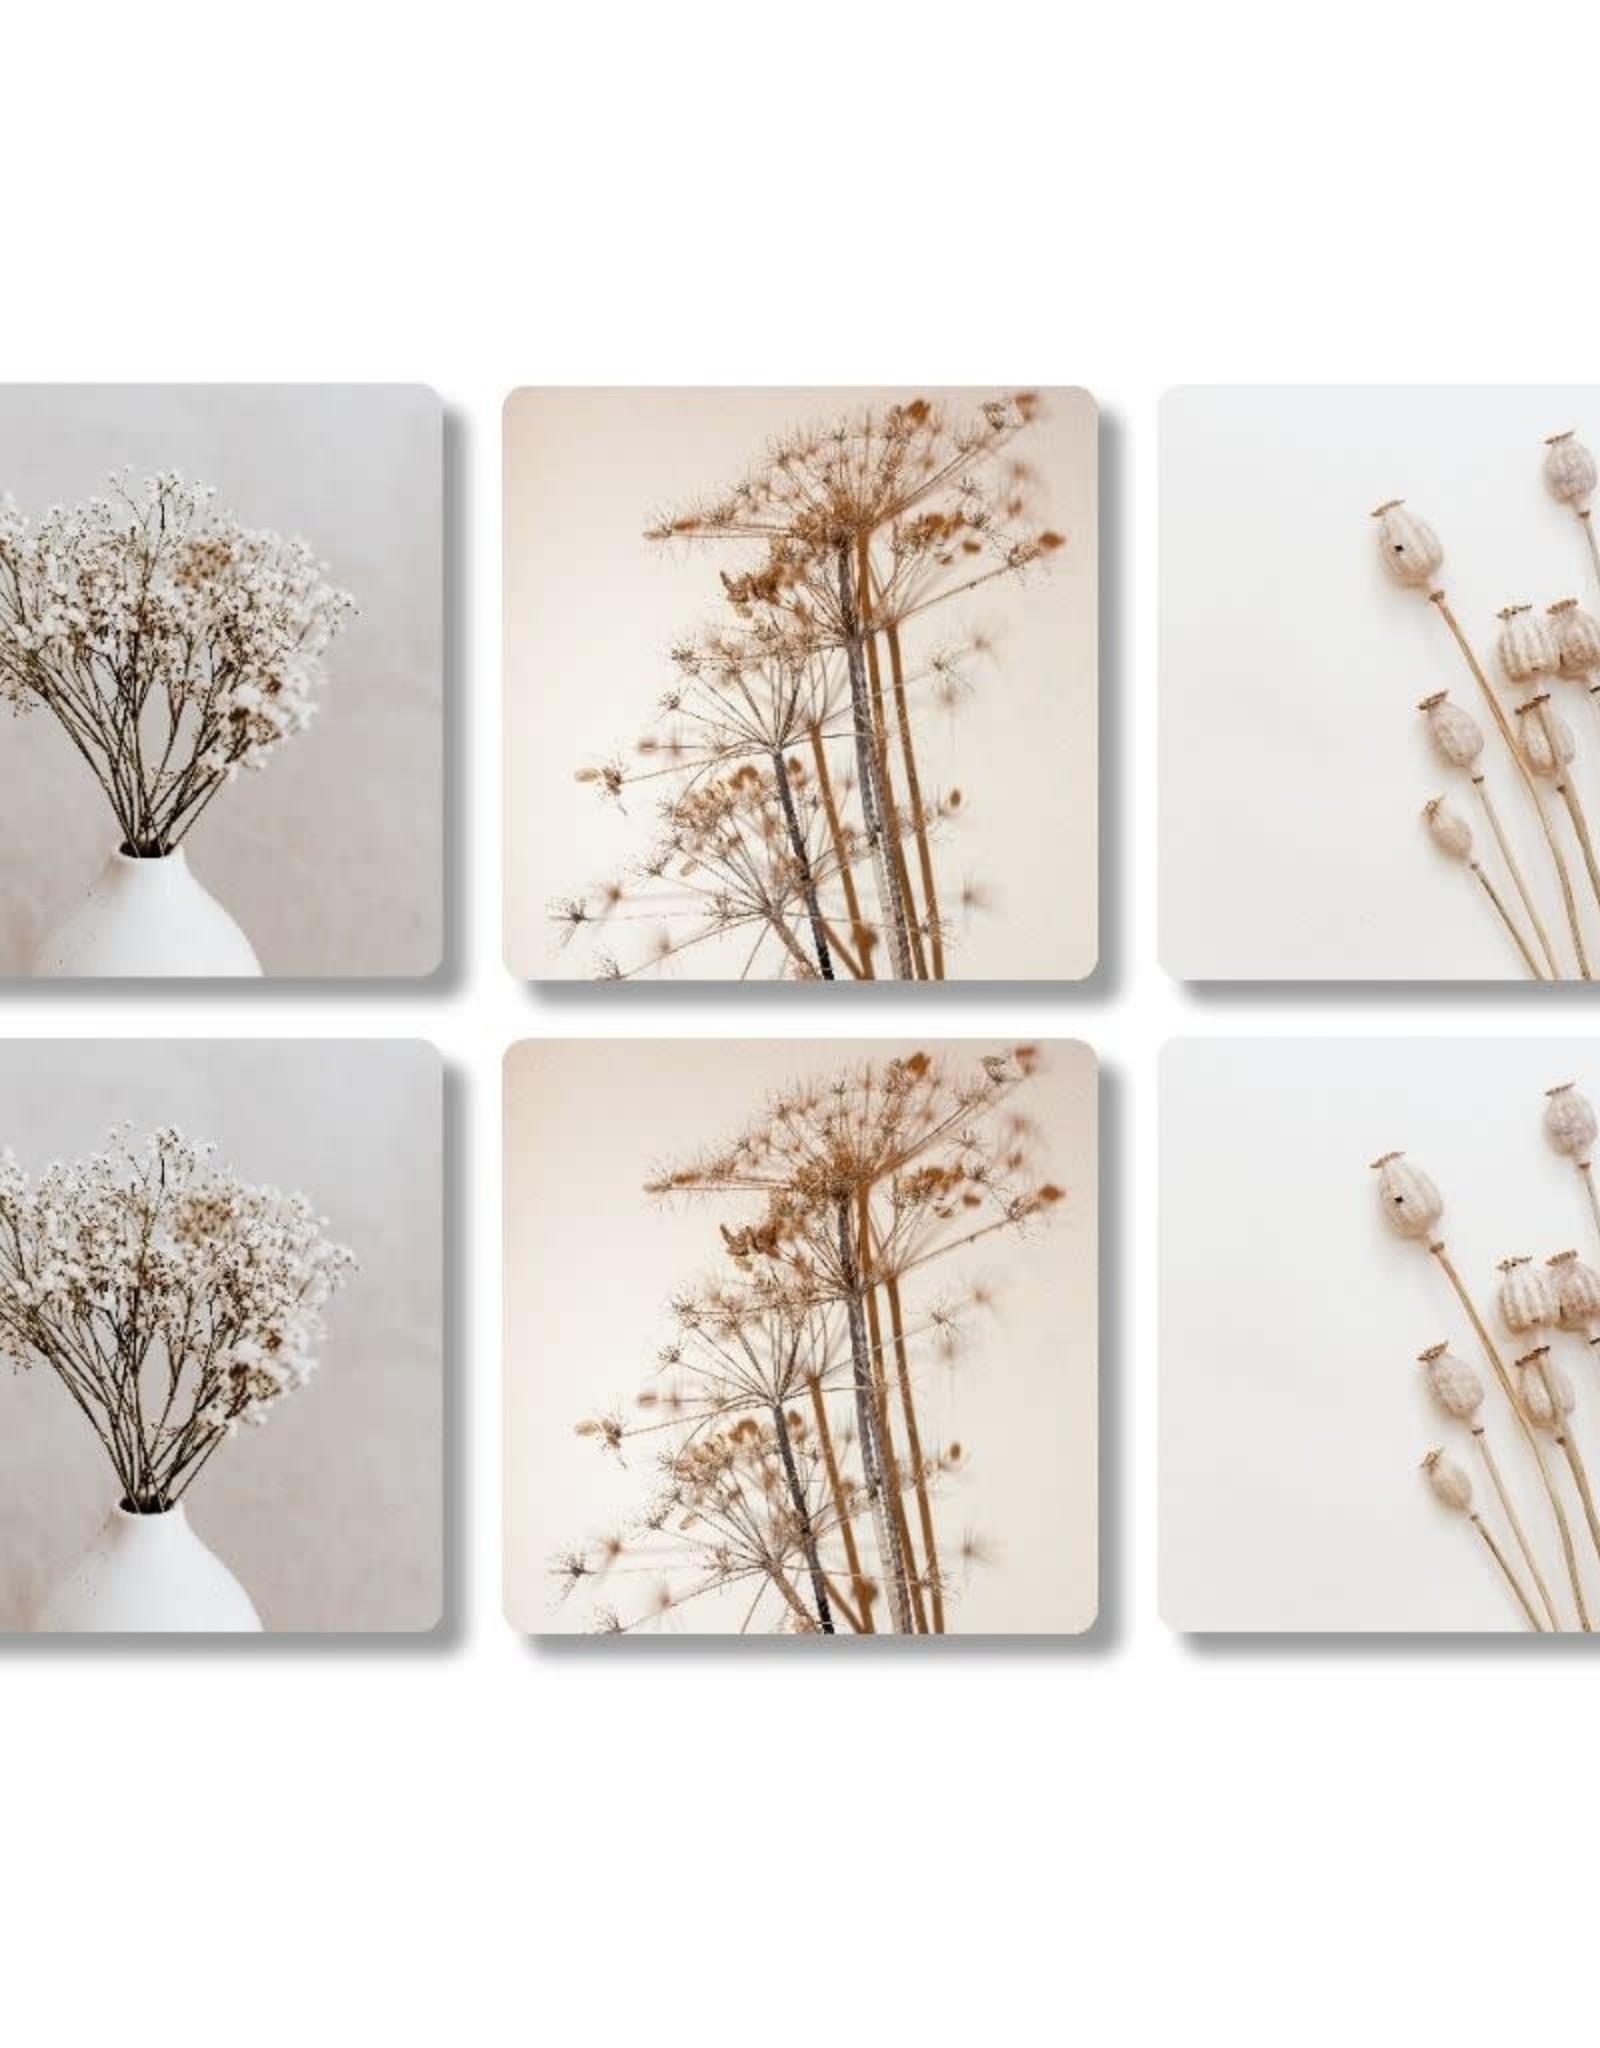 The Big Gifts Onderzetters 6stuks Plant/Bloem - The Big Gifts